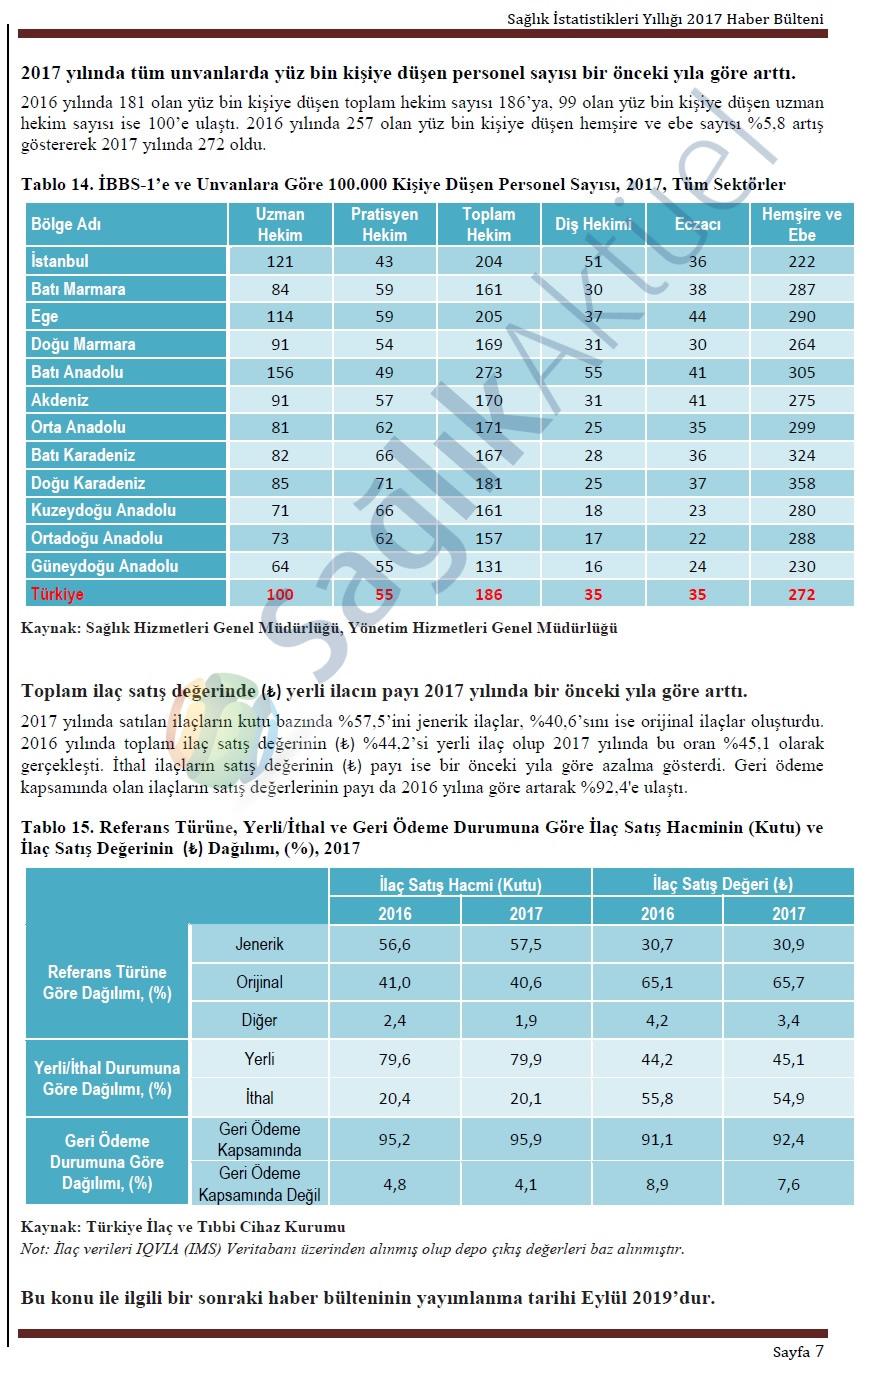 saglik-istatistikleri-yilligi-2016-7-001.jpg